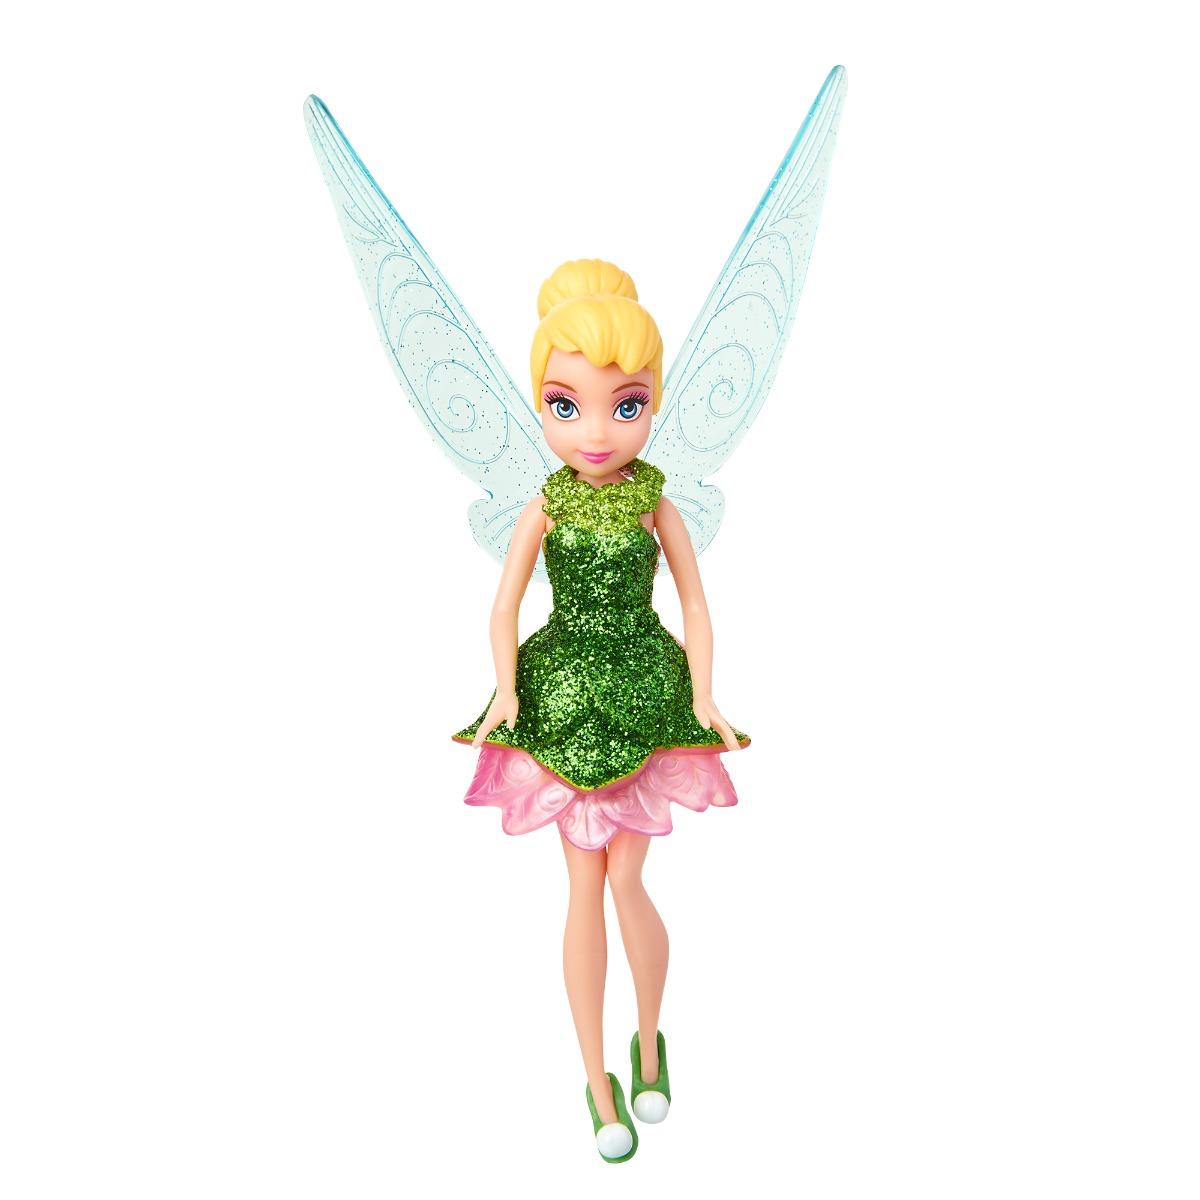 Papusa Disney Fairies, Tinker Bell, Verde, 12 cm